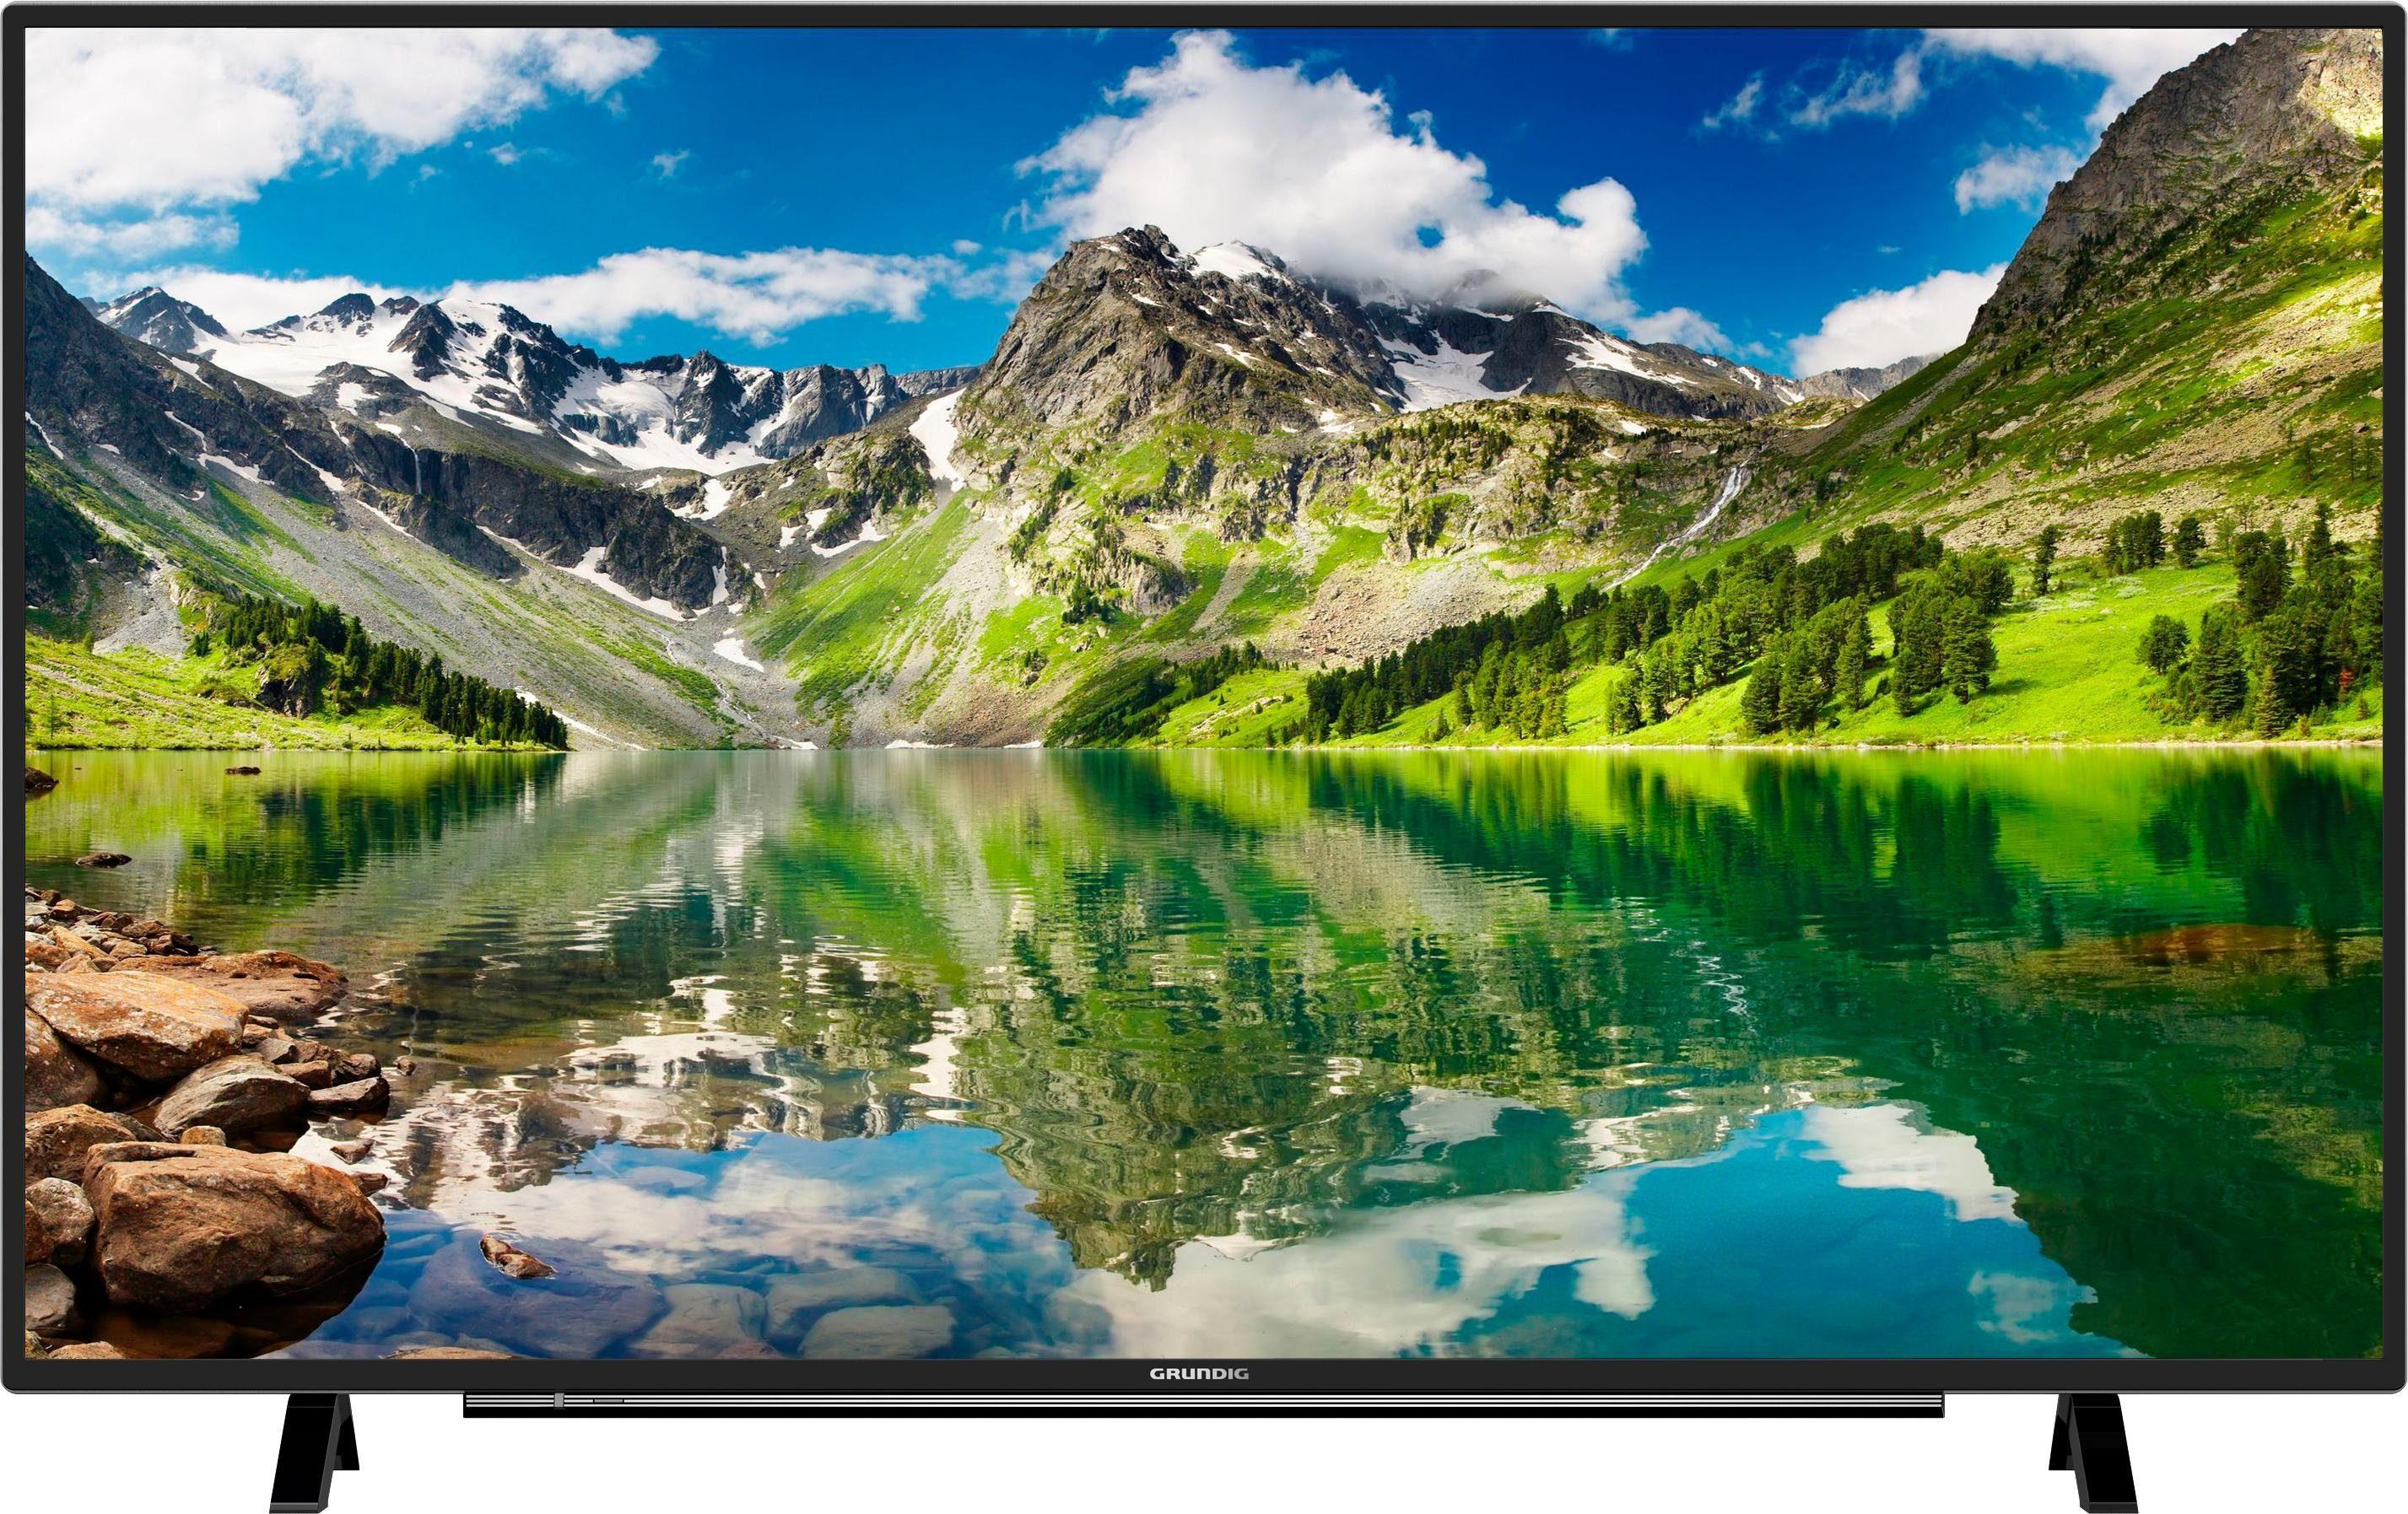 Grundig 65 VLX 7100 BP LED-Fernseher (65 Zoll, 4K Ultra HD, Smart-TV)